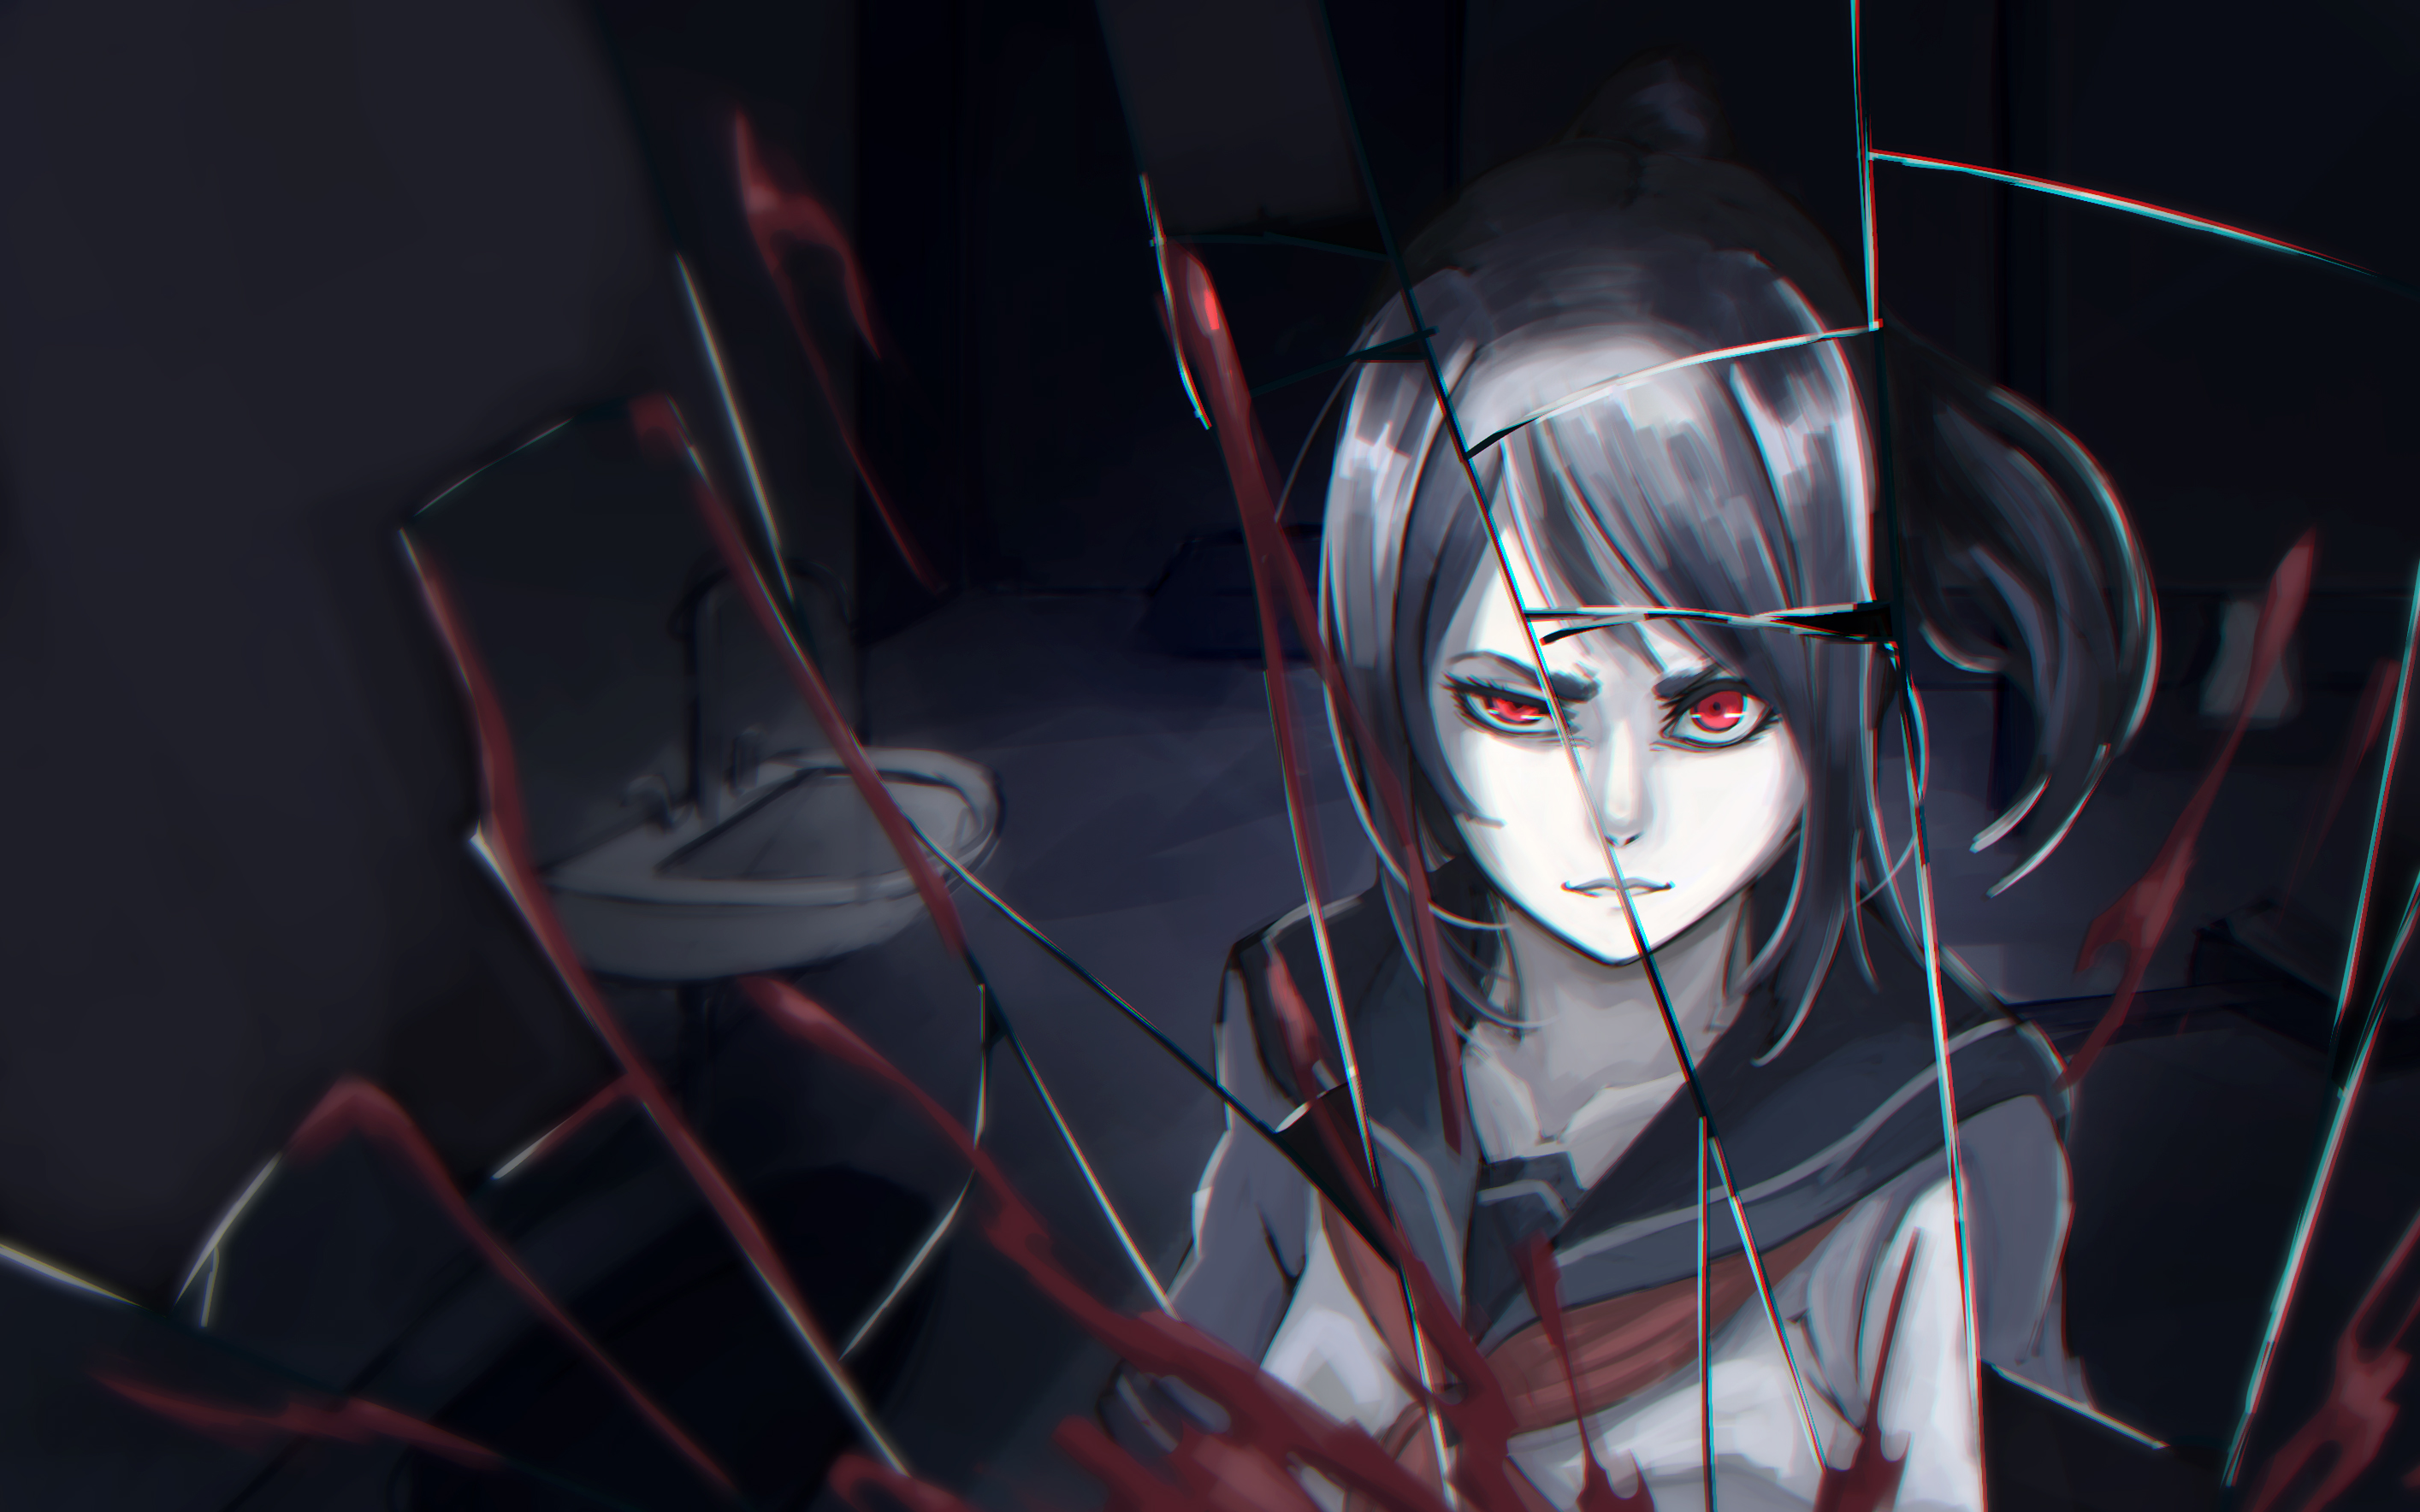 Anime Yandere Wallpaper Hd 2829x1768